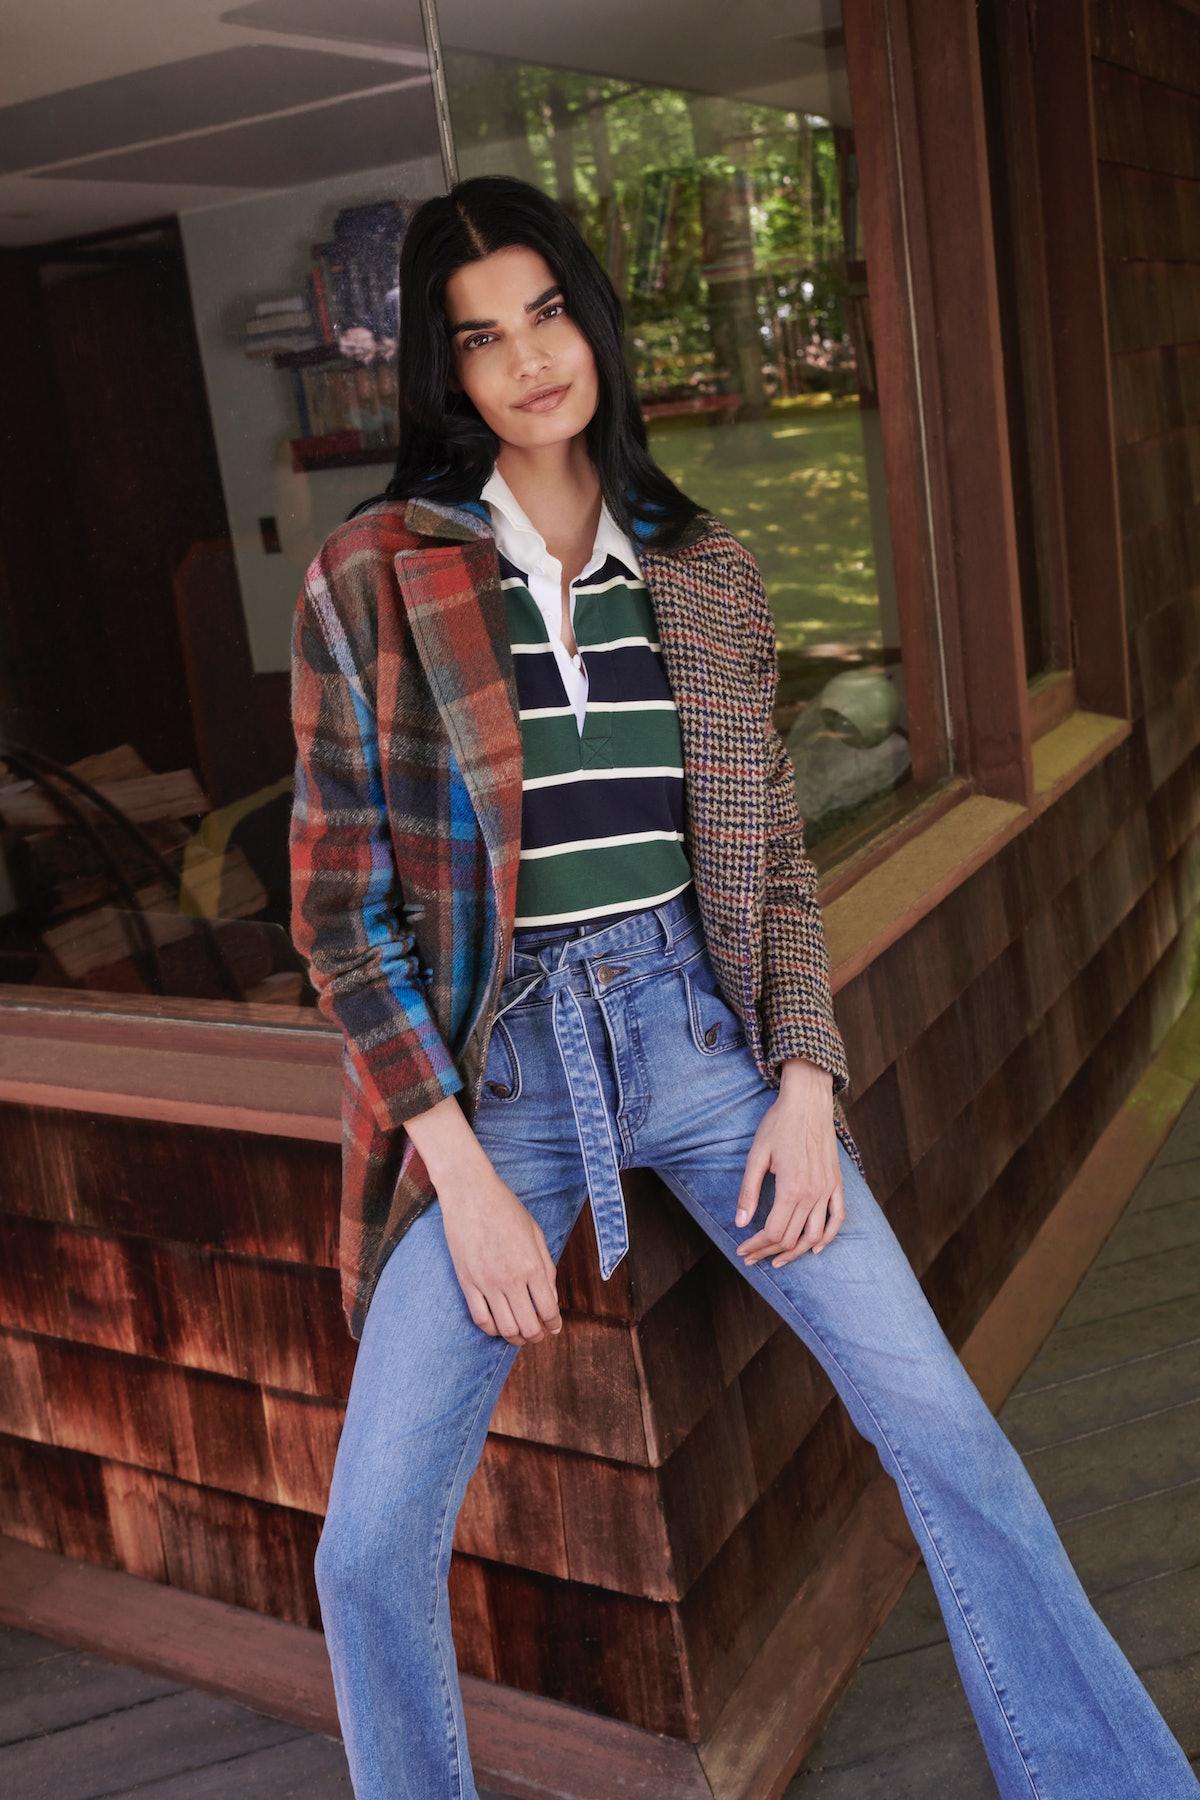 Model wears Veronica Beard's India Patchwork Dickey Coat